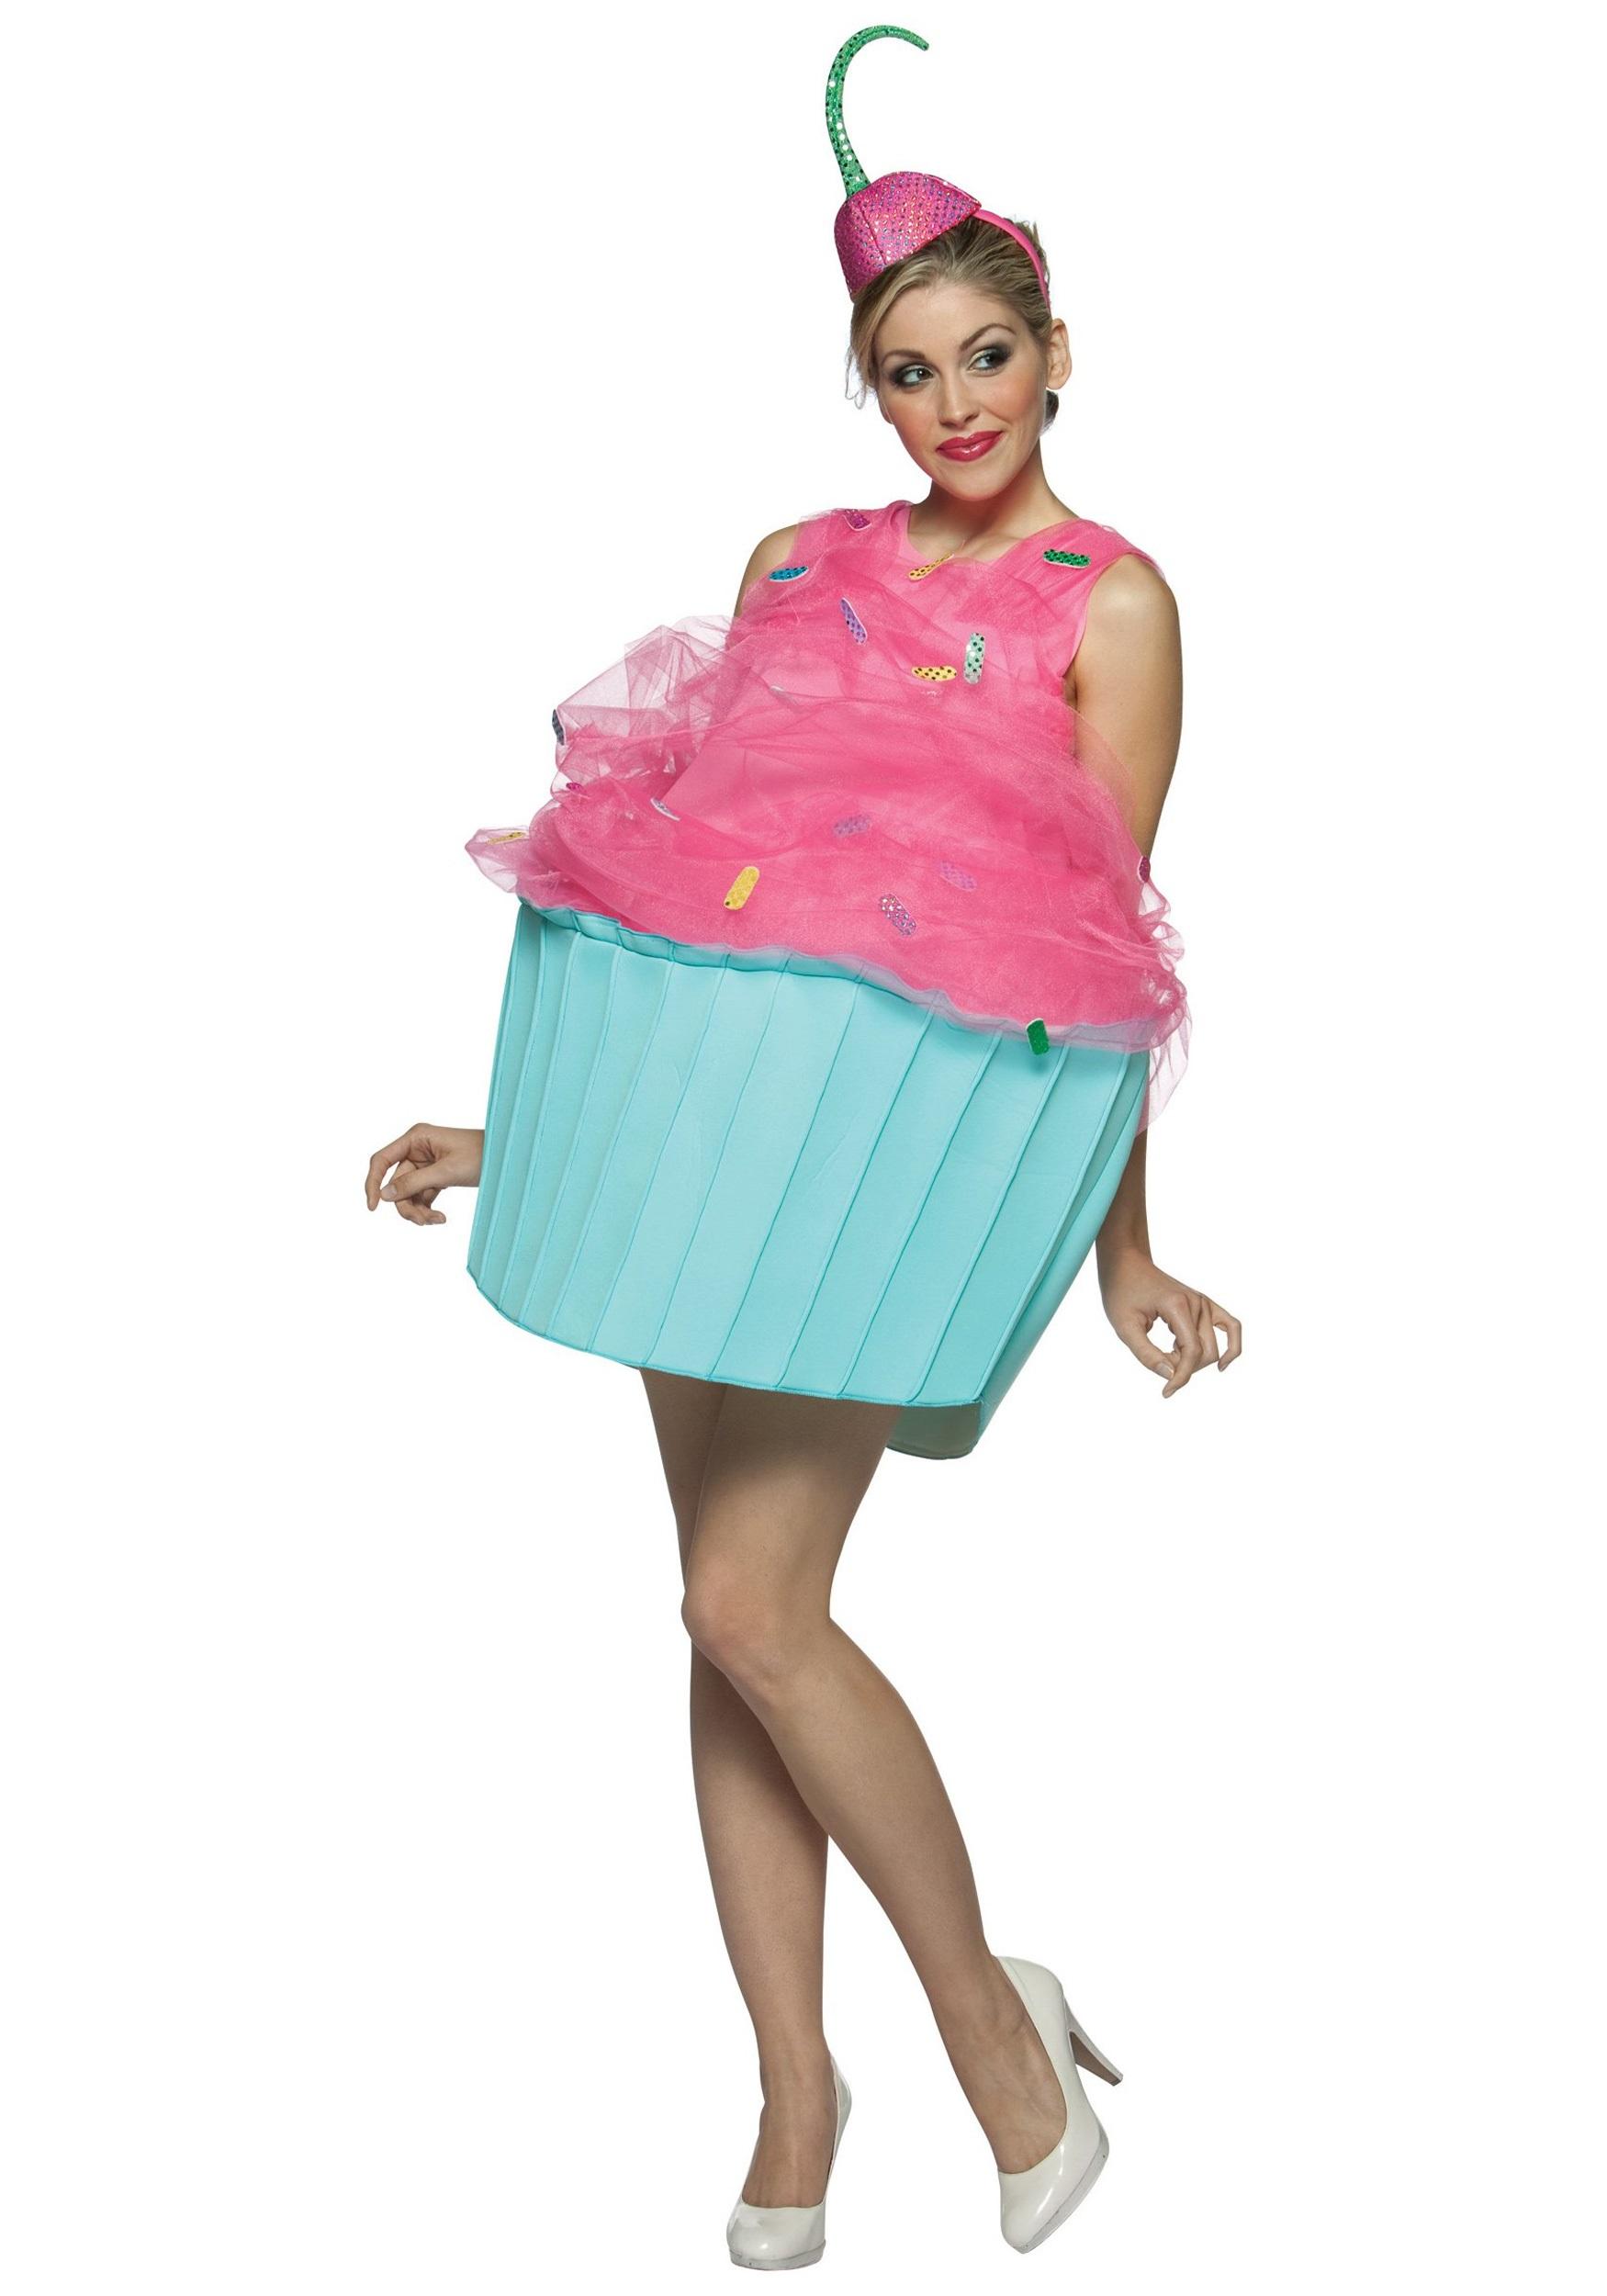 Womens Cupcake Costume  sc 1 st  Halloween Costumes UK & Food Costumes - Adult Kids Food and Drink Halloween Costume Ideas